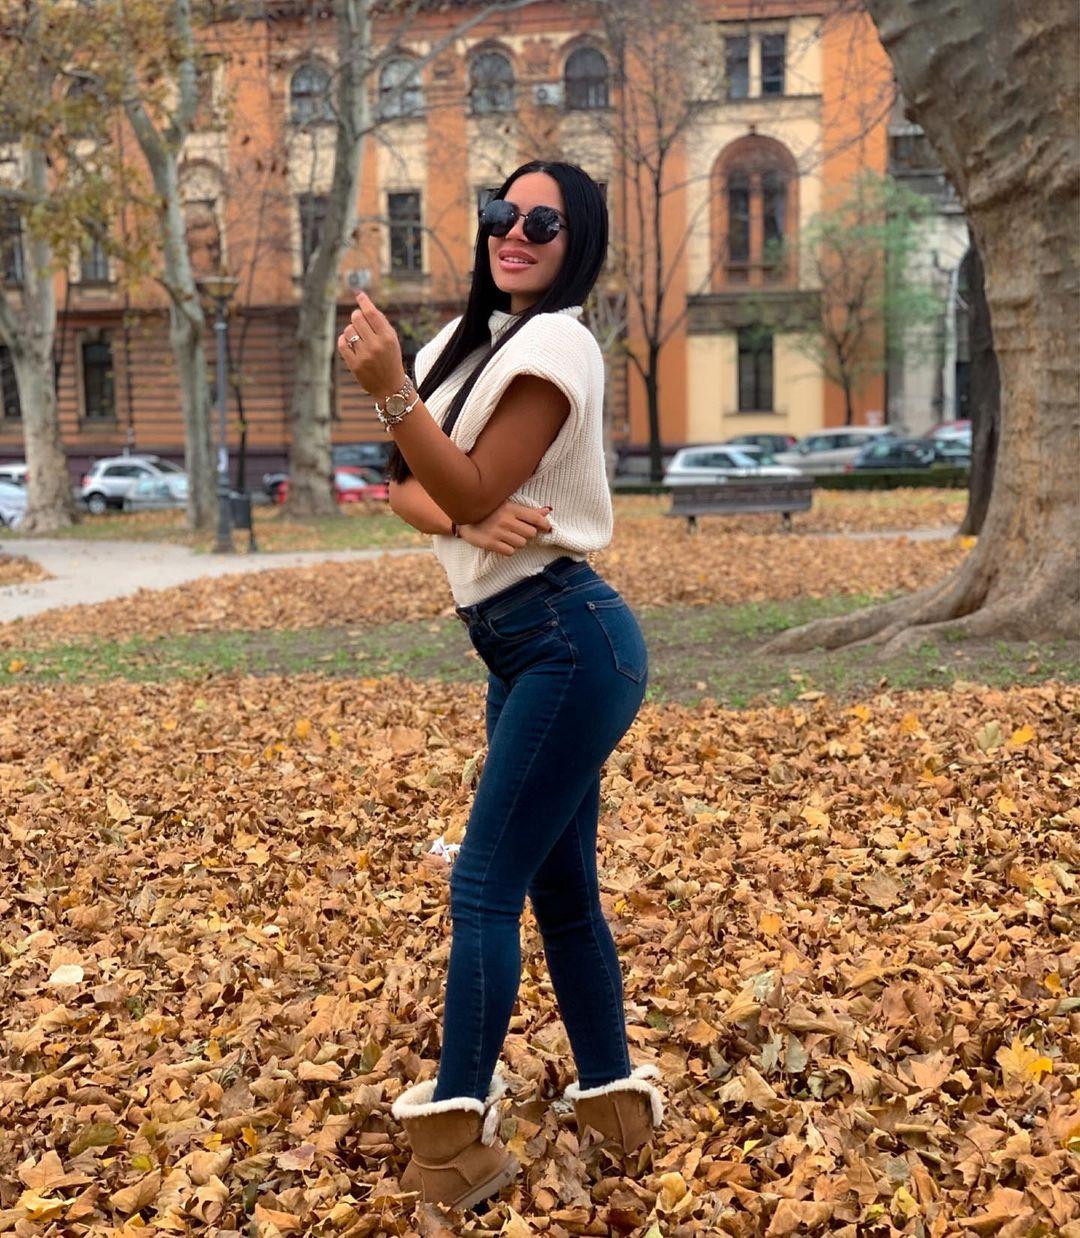 Andrea-Coco-Wallpapers-Insta-Fit-Bio-1